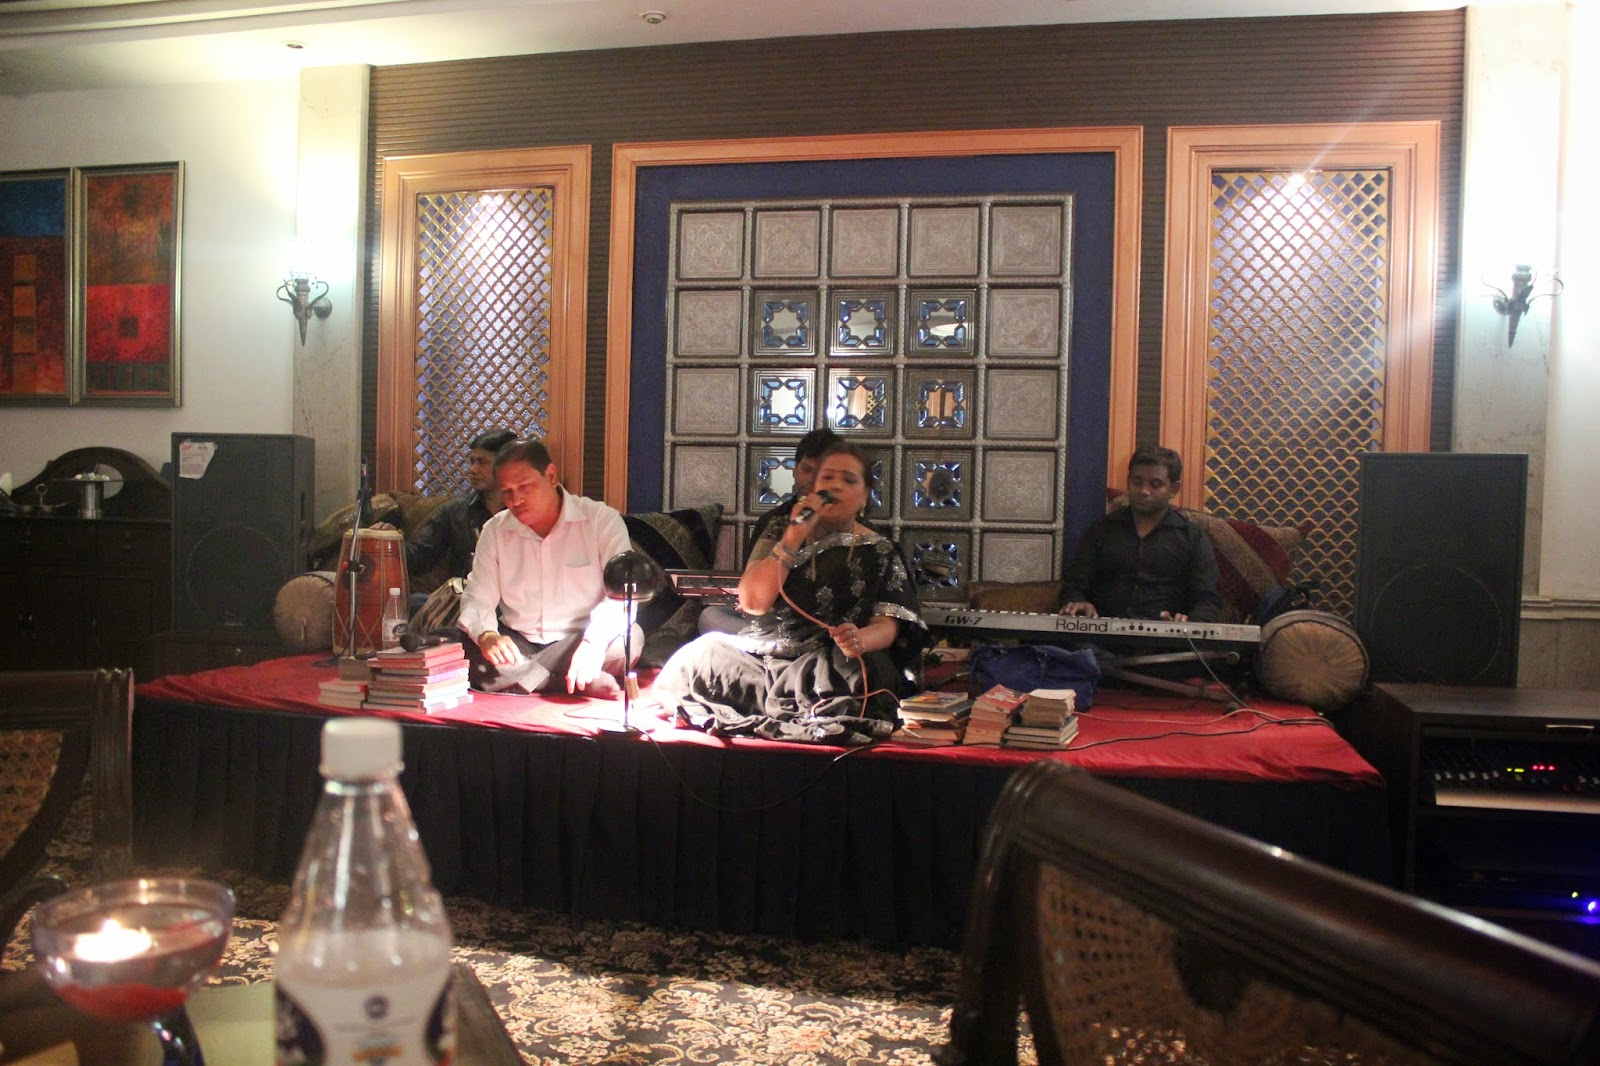 Kumar Bappa and Madhvi Bose - The Luscious Mughlai,Lucknowi food @ zaffran The Bristol Hotel, Gurgaon